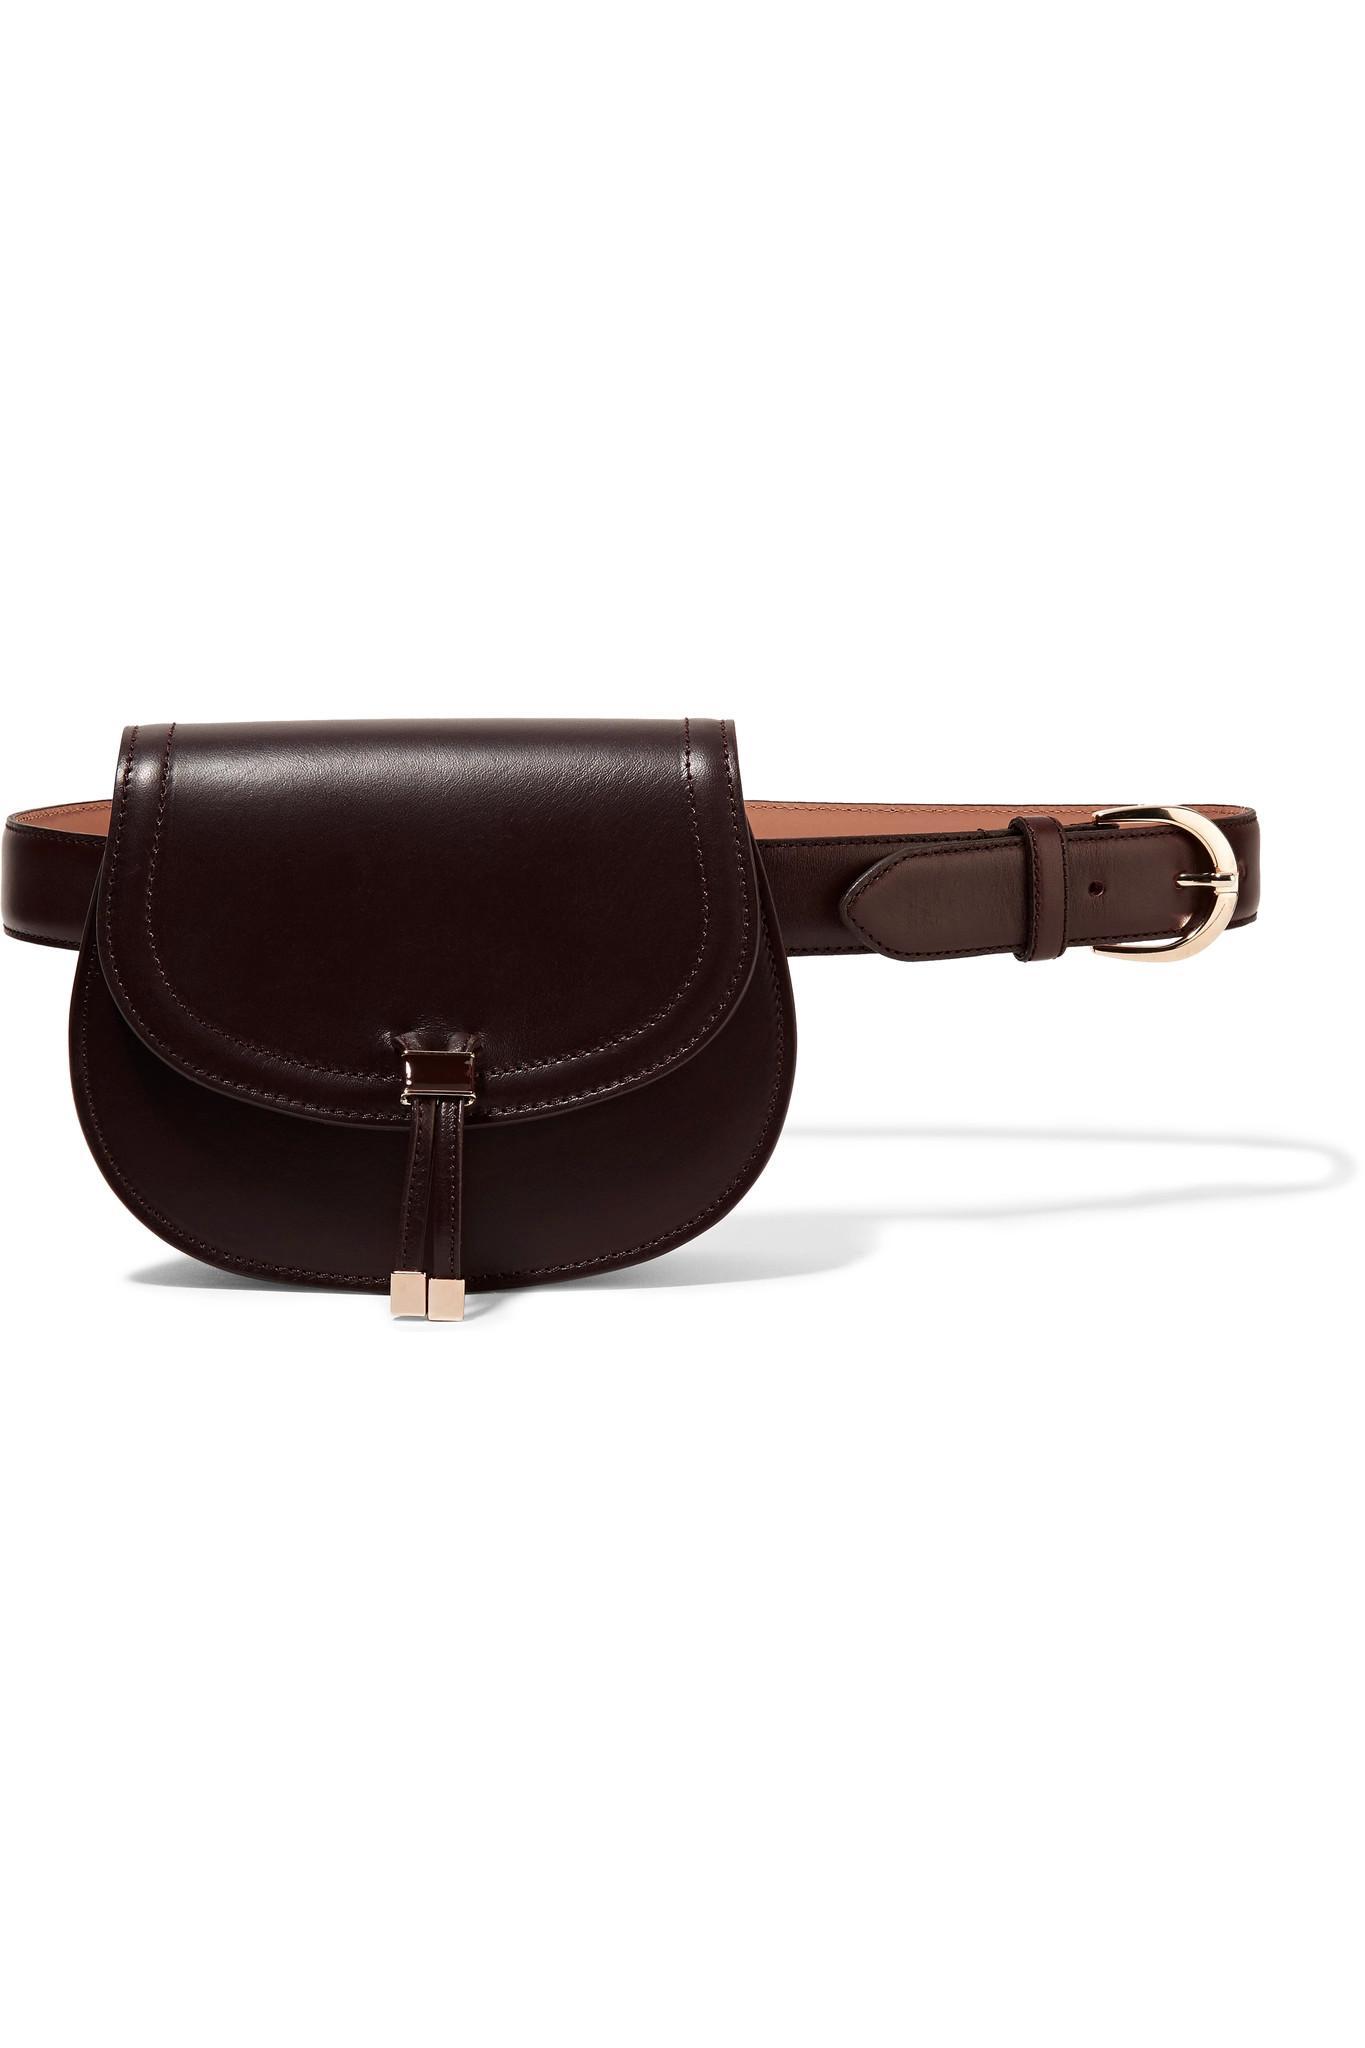 seward clever leather belt bag lyst